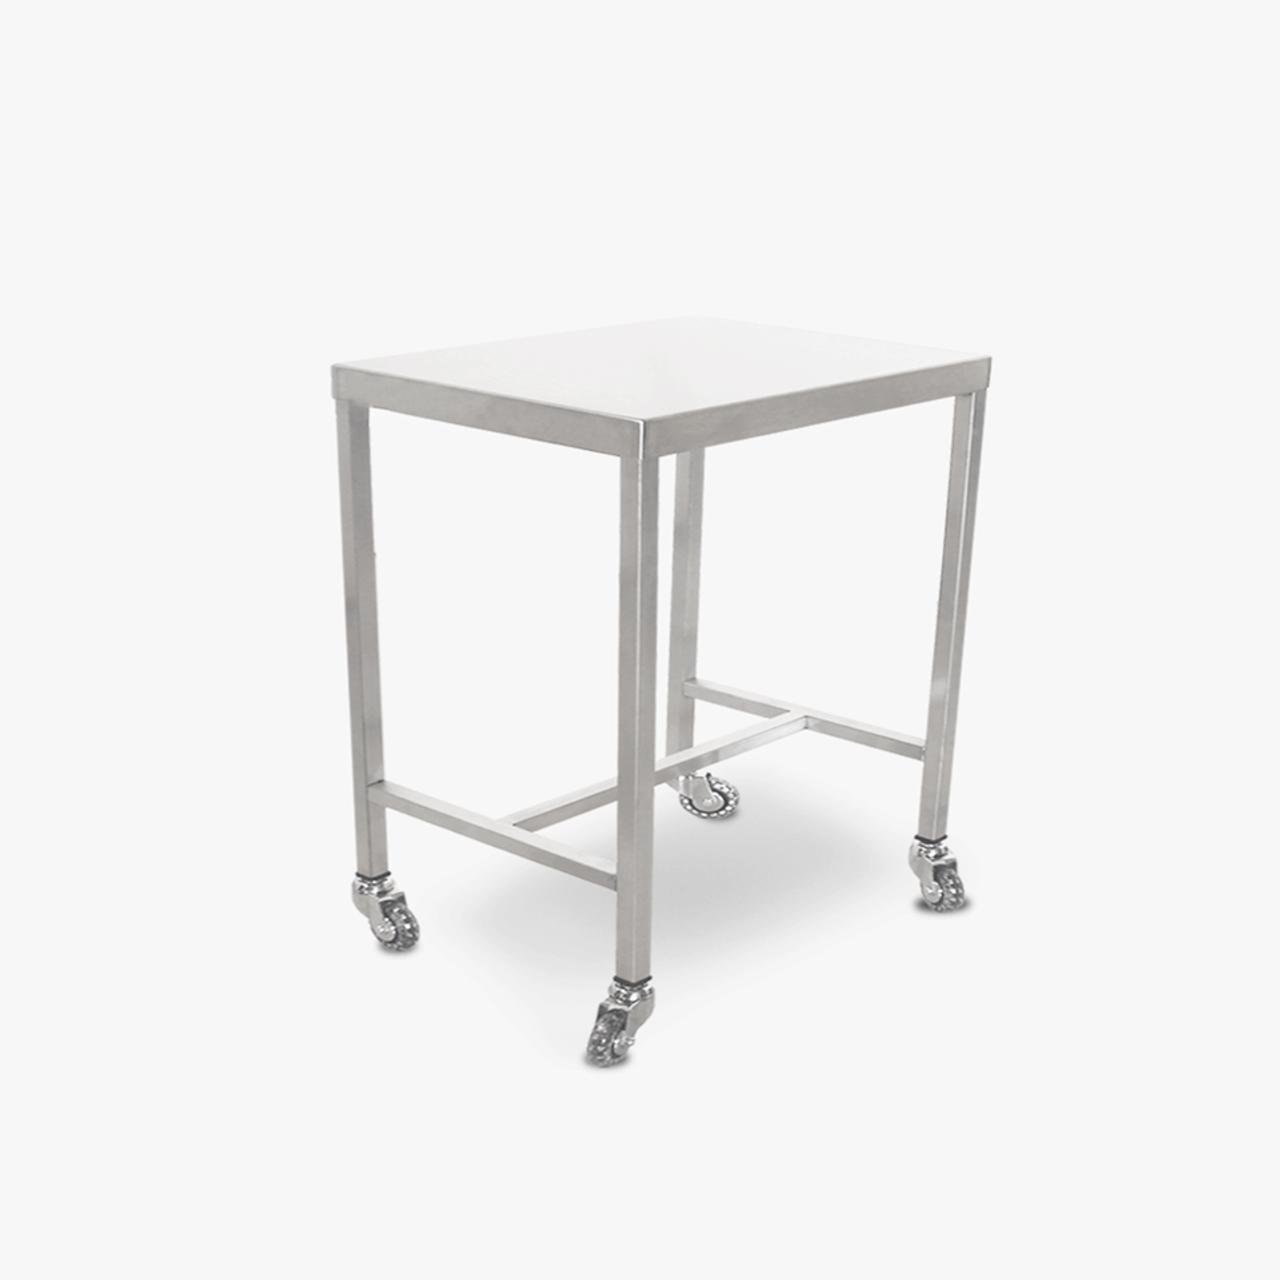 ITH   1630   16 X 30 X 34 Instrument Table W/ H Brace